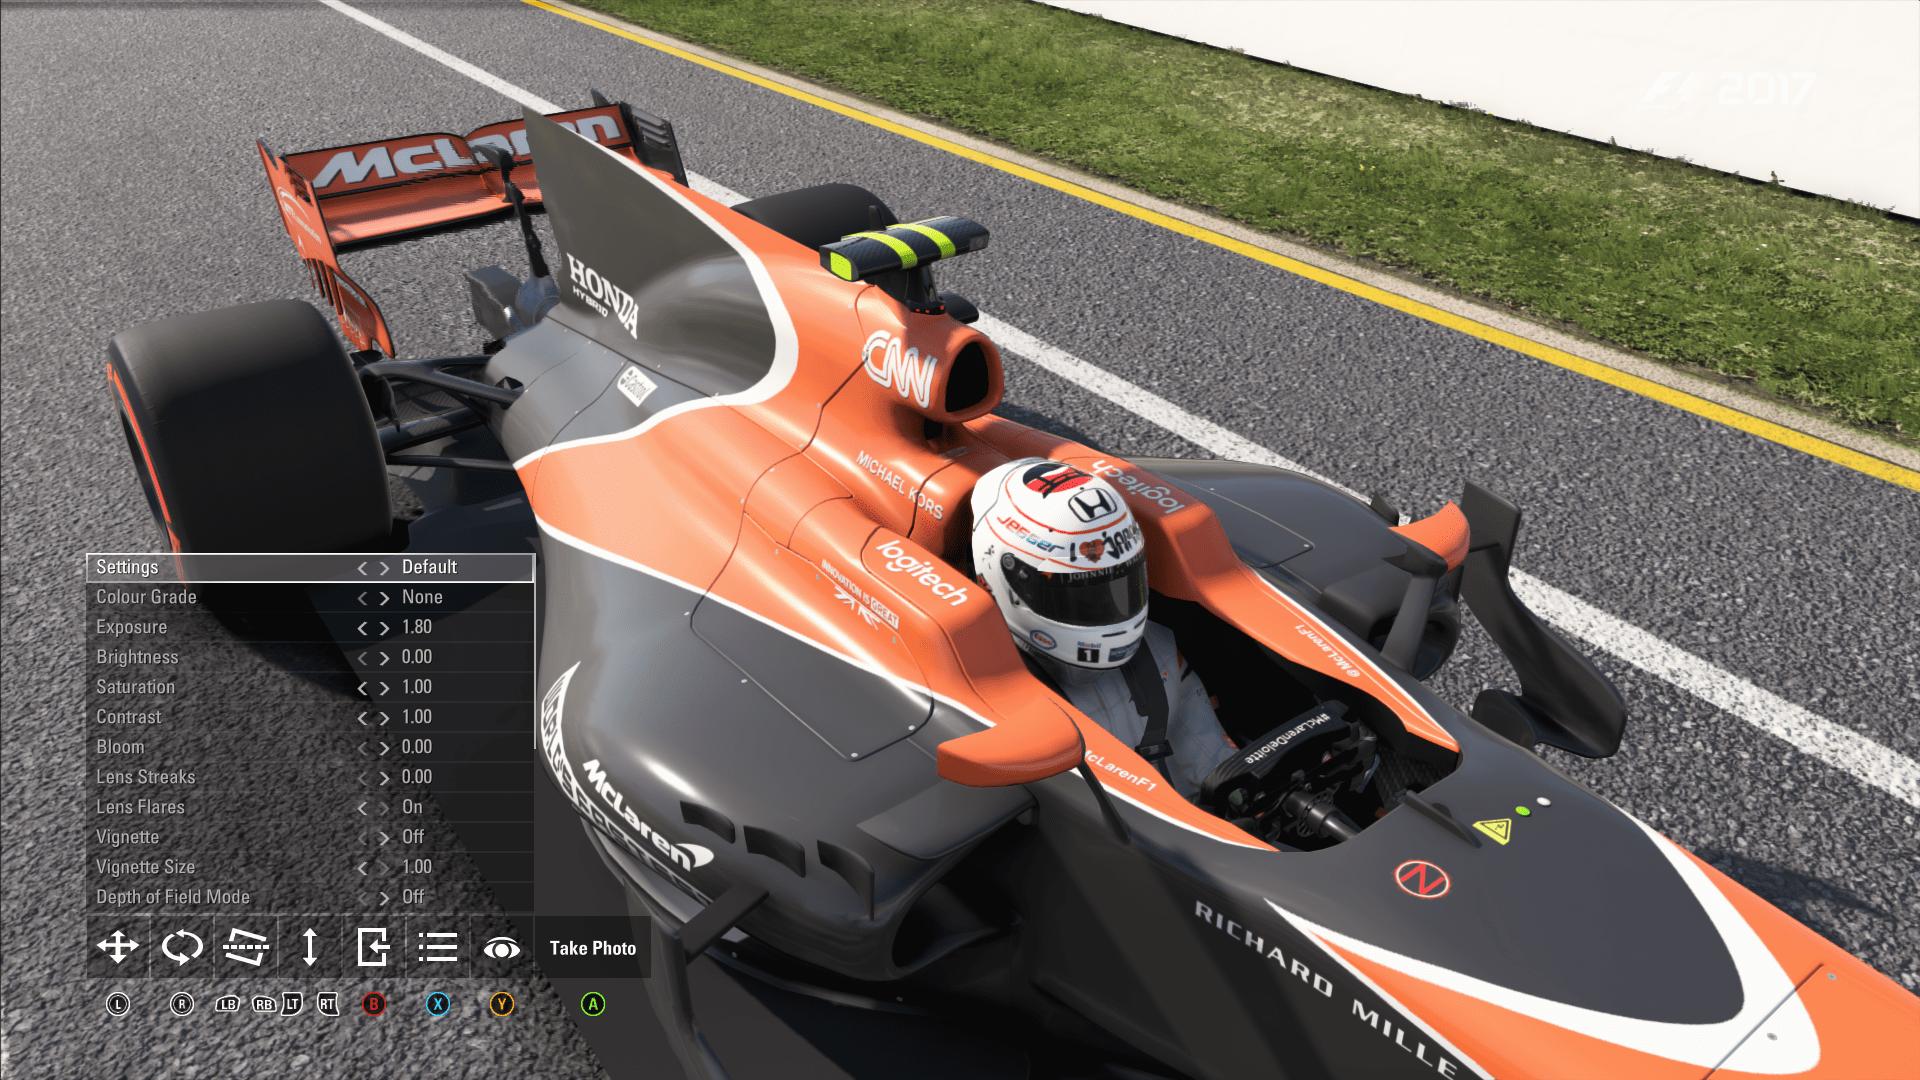 F1 2017 Screenshot 2018.02.21 - 01.15.51.53-min.png